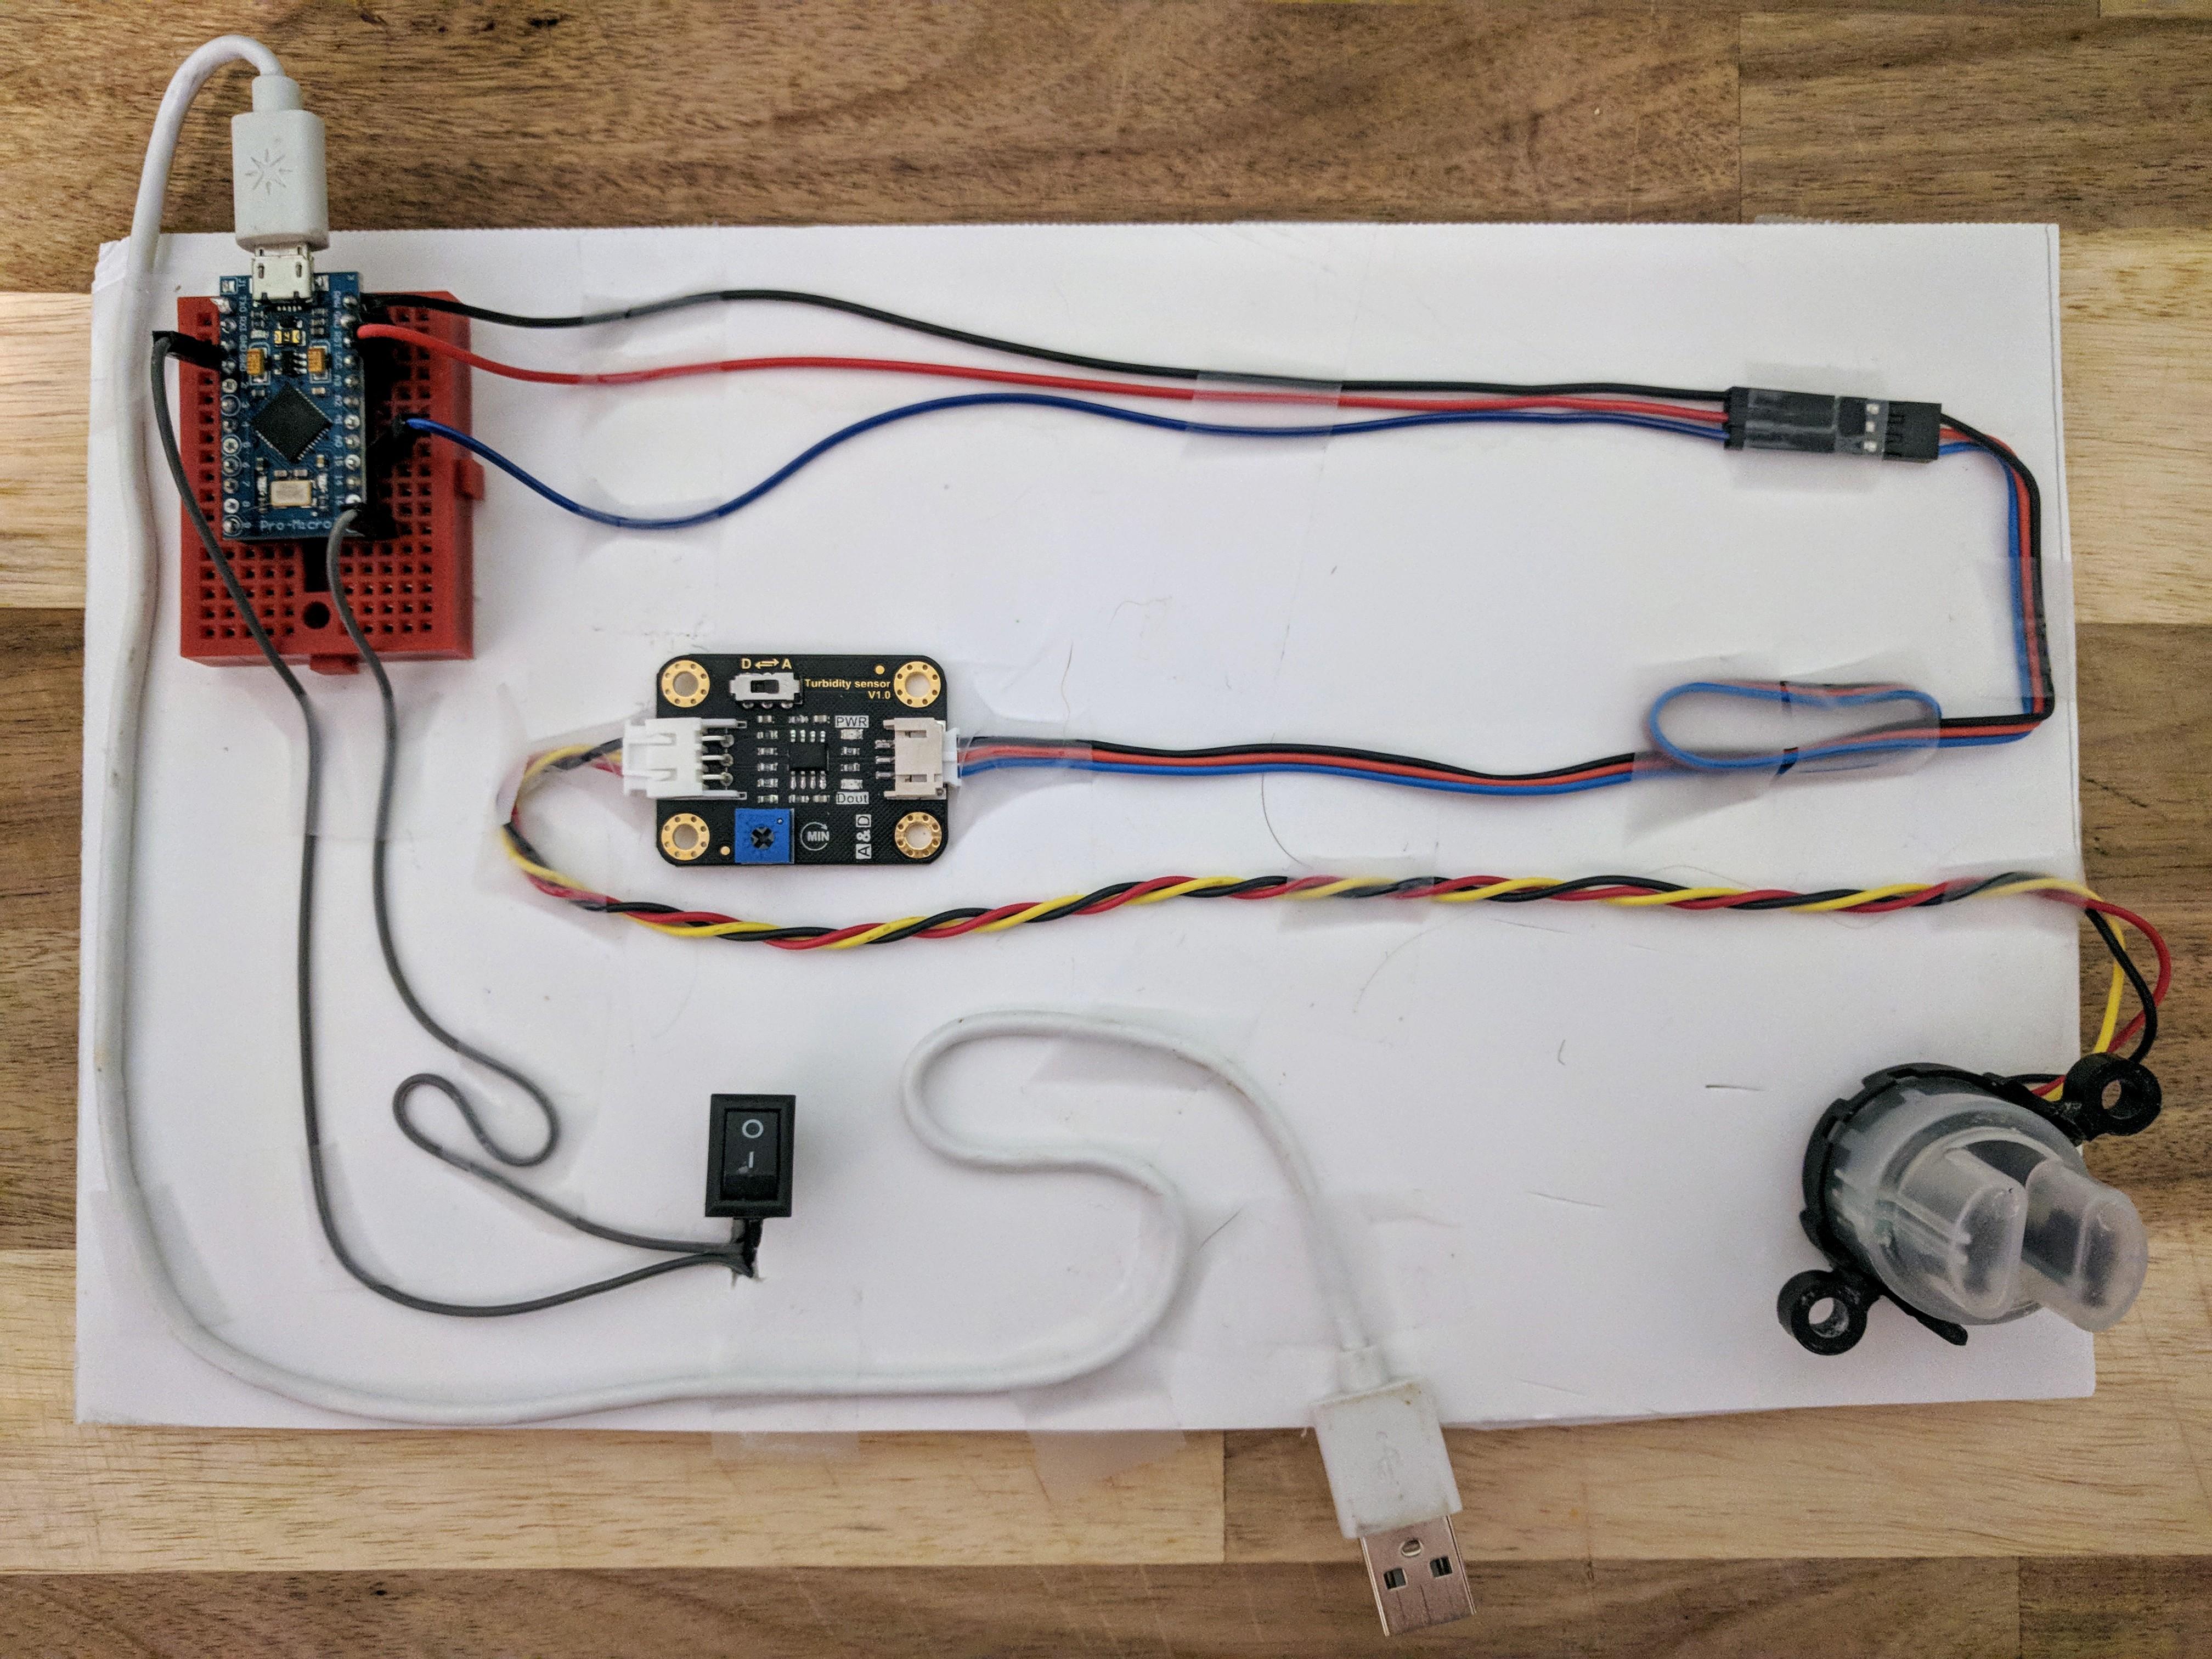 Simple turbidity sensor